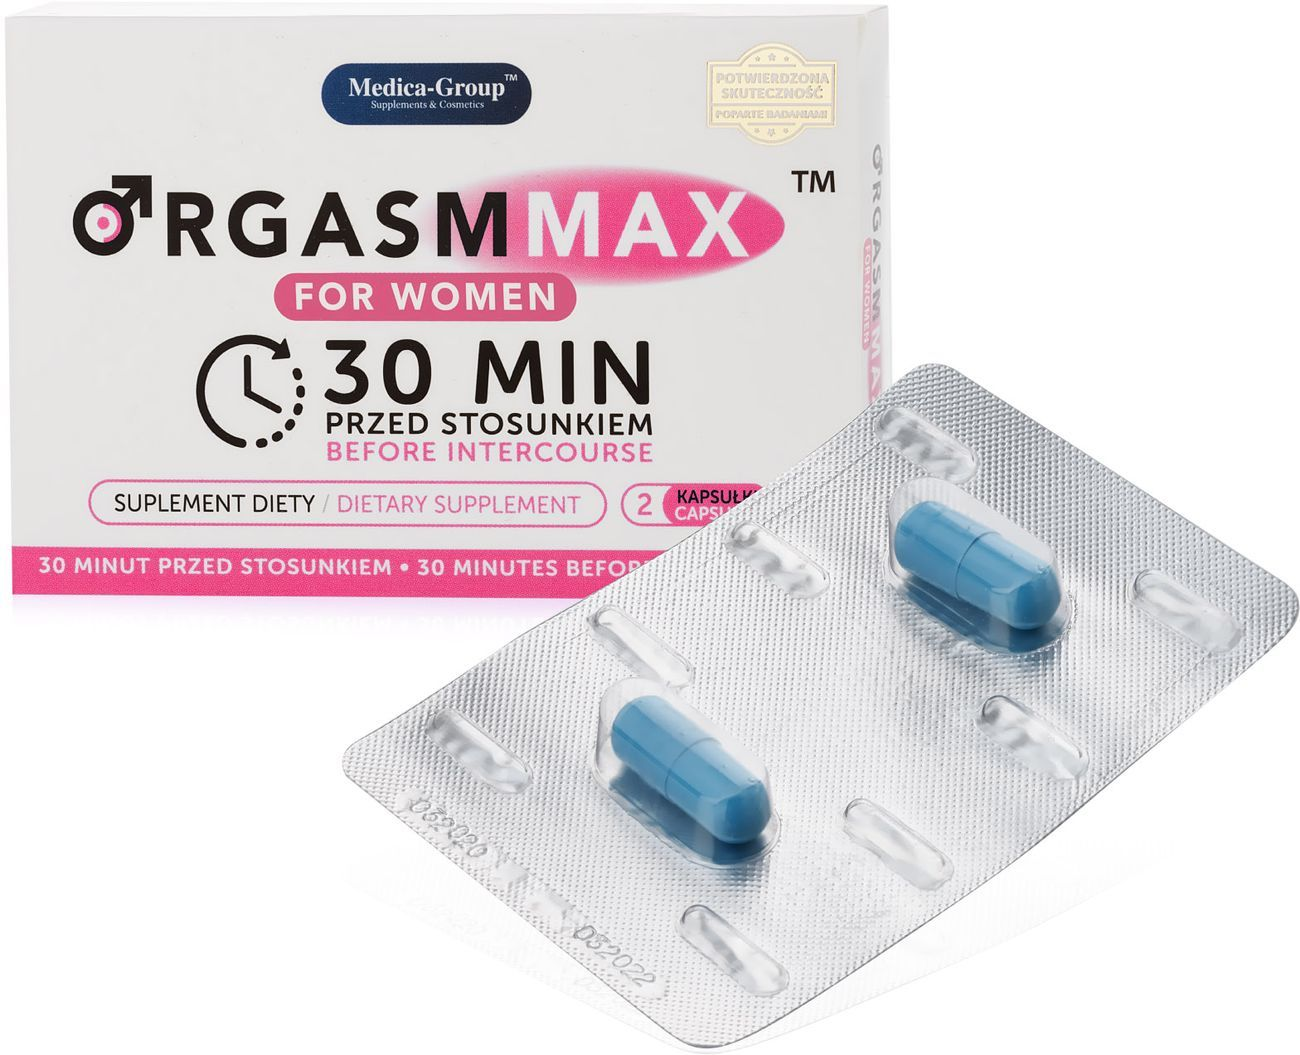 ORGASM MAX FOR WOMEN - TABLETKI NA LIBIDO - 2 KAPSUŁKI - 75904889